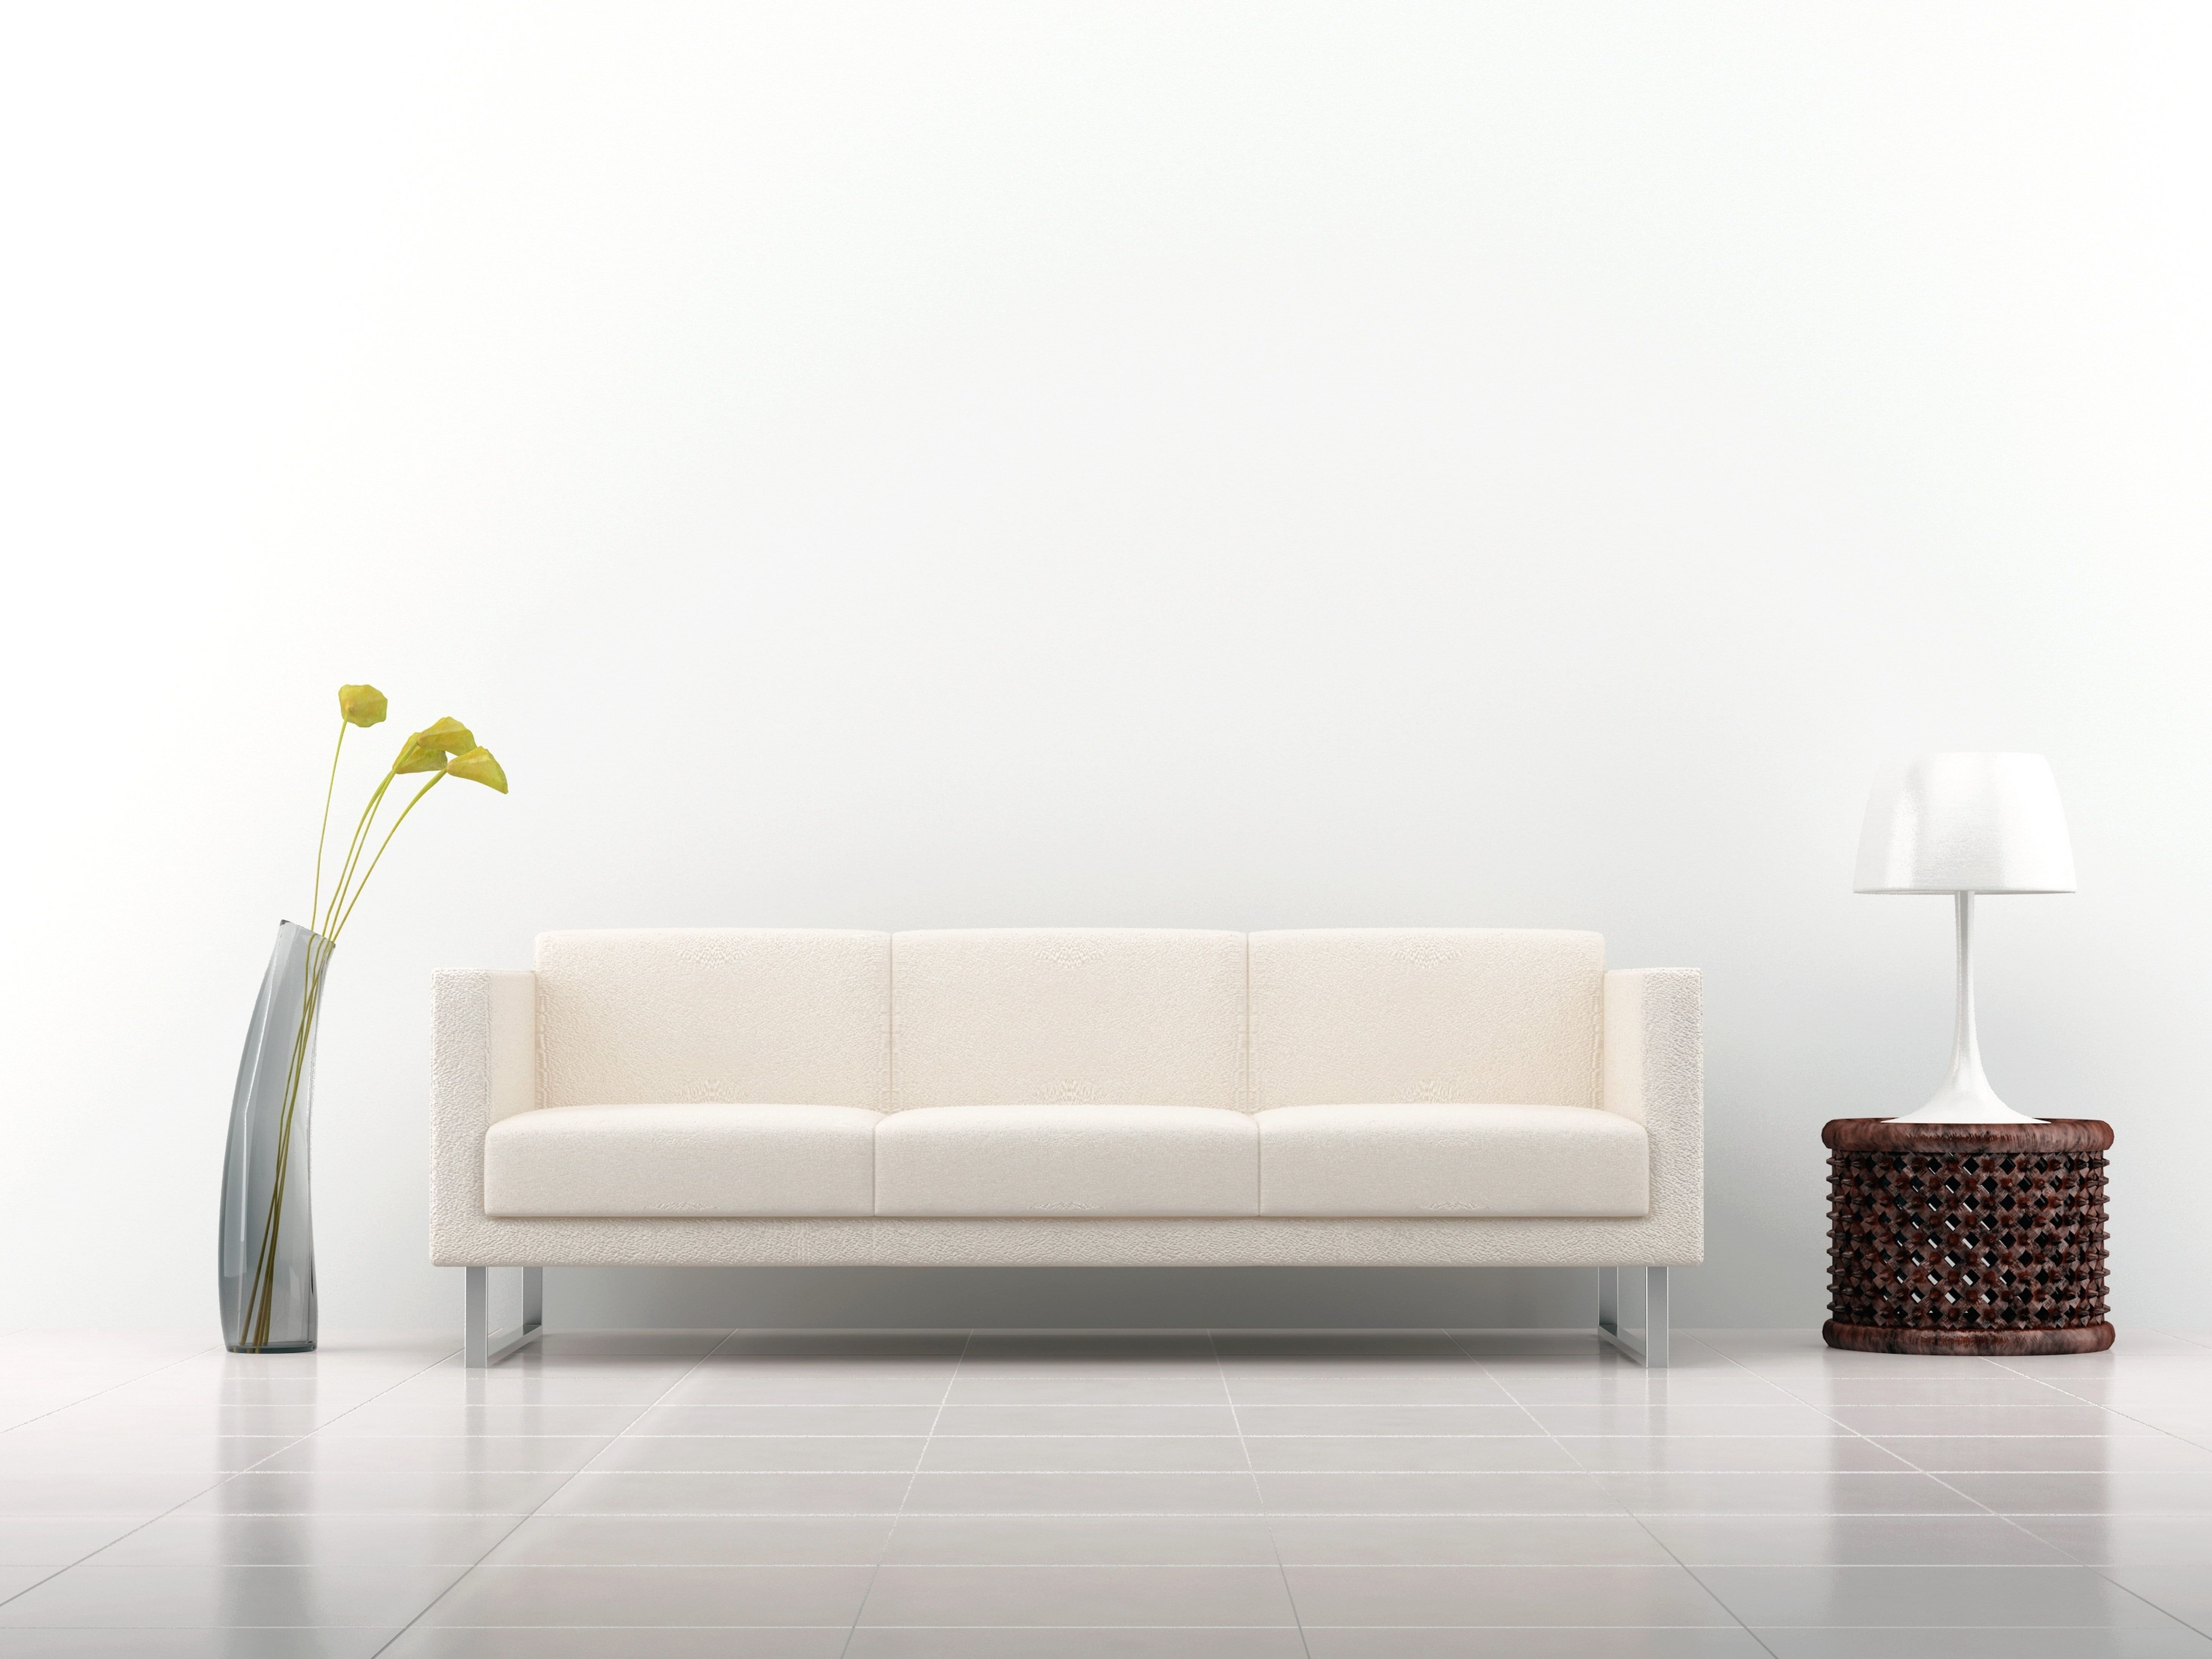 White 3 Seat Sofa Sofa Decoration Interior Vase Lamp White Background 5k Wallpaper Hdwallpap Living Room Wall Color Simple Living Room Room Wall Colors White living room background